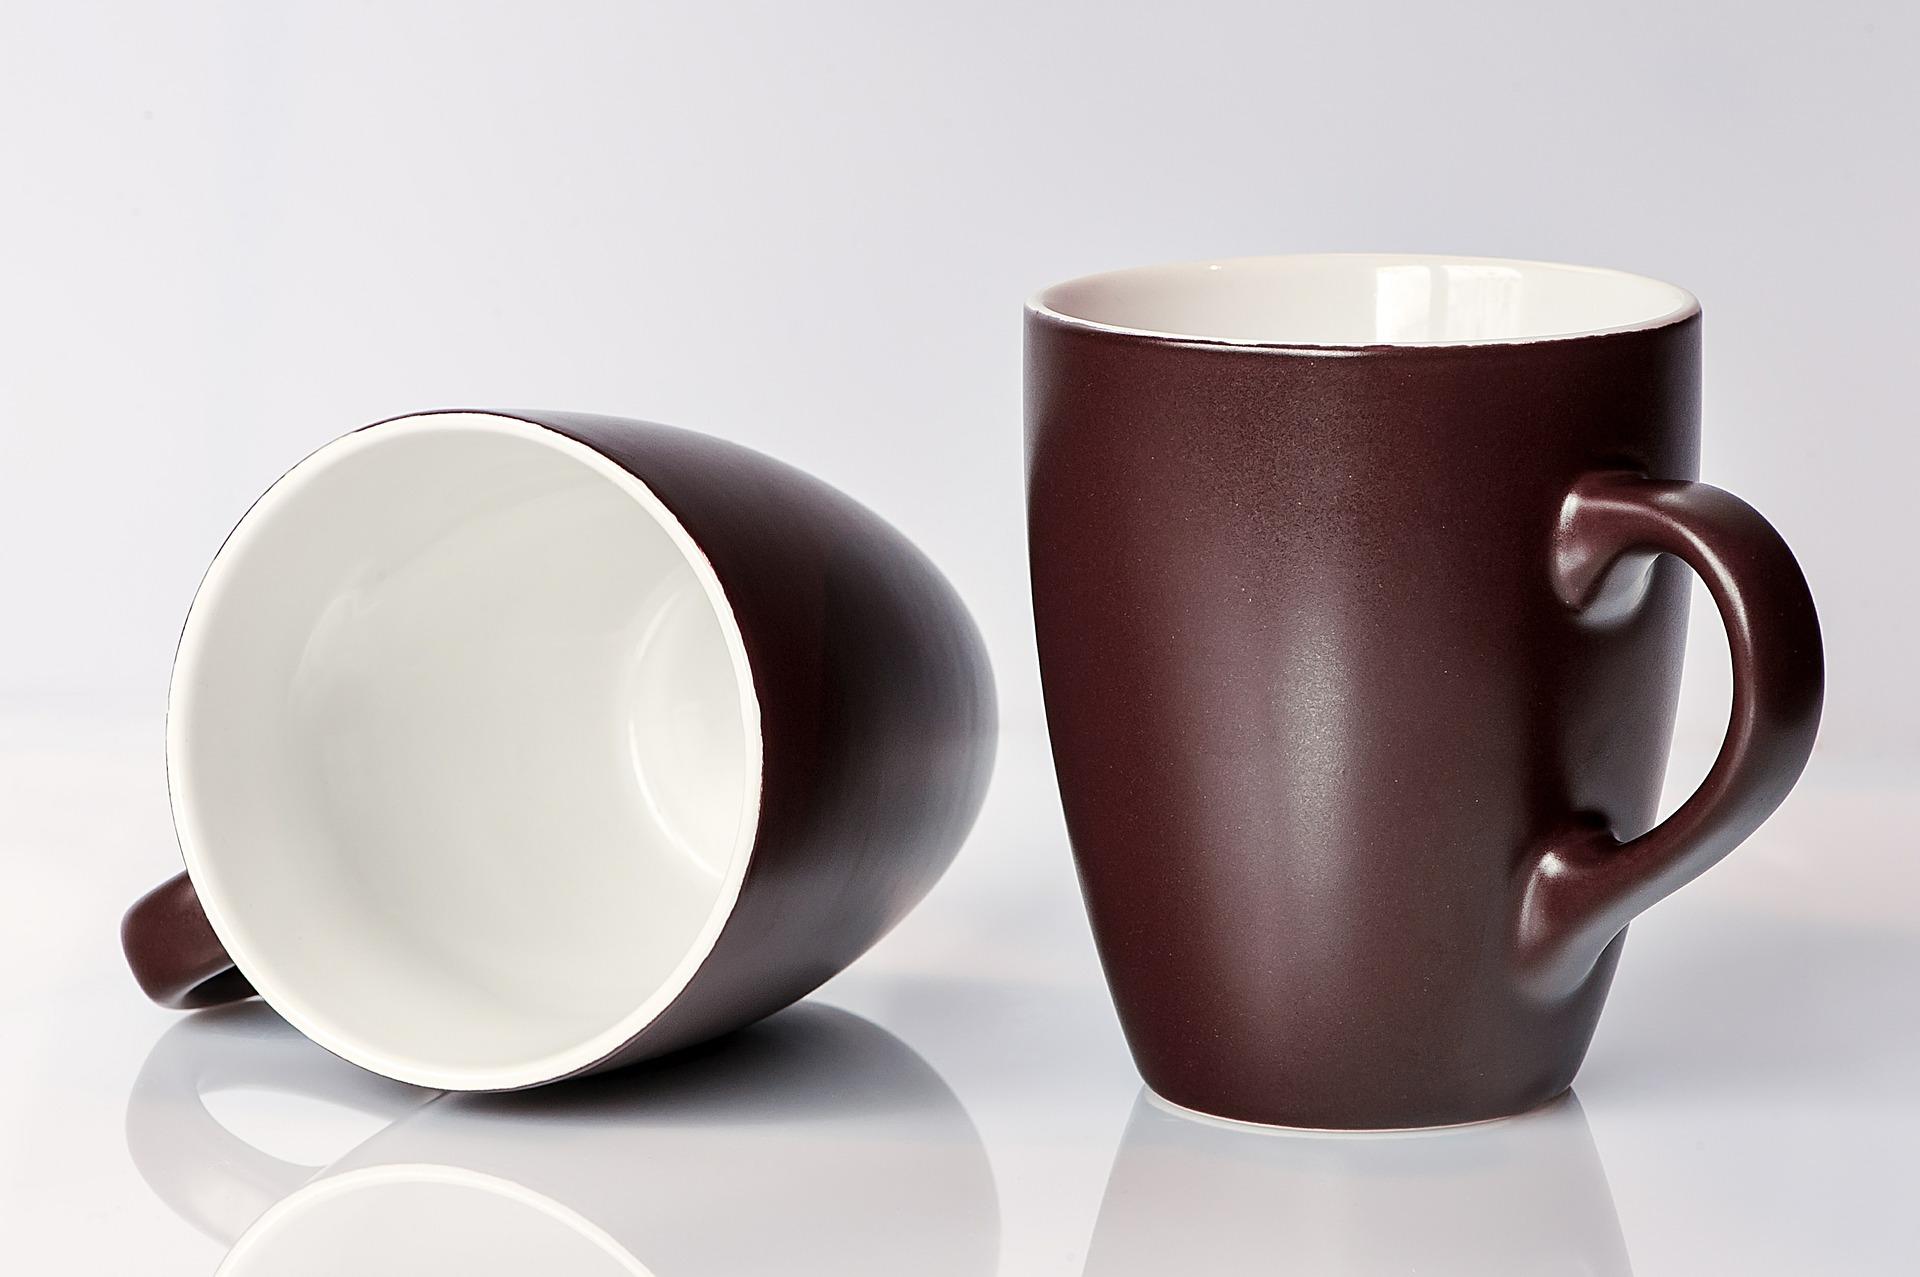 coffee-mugs-459324_1920.jpg